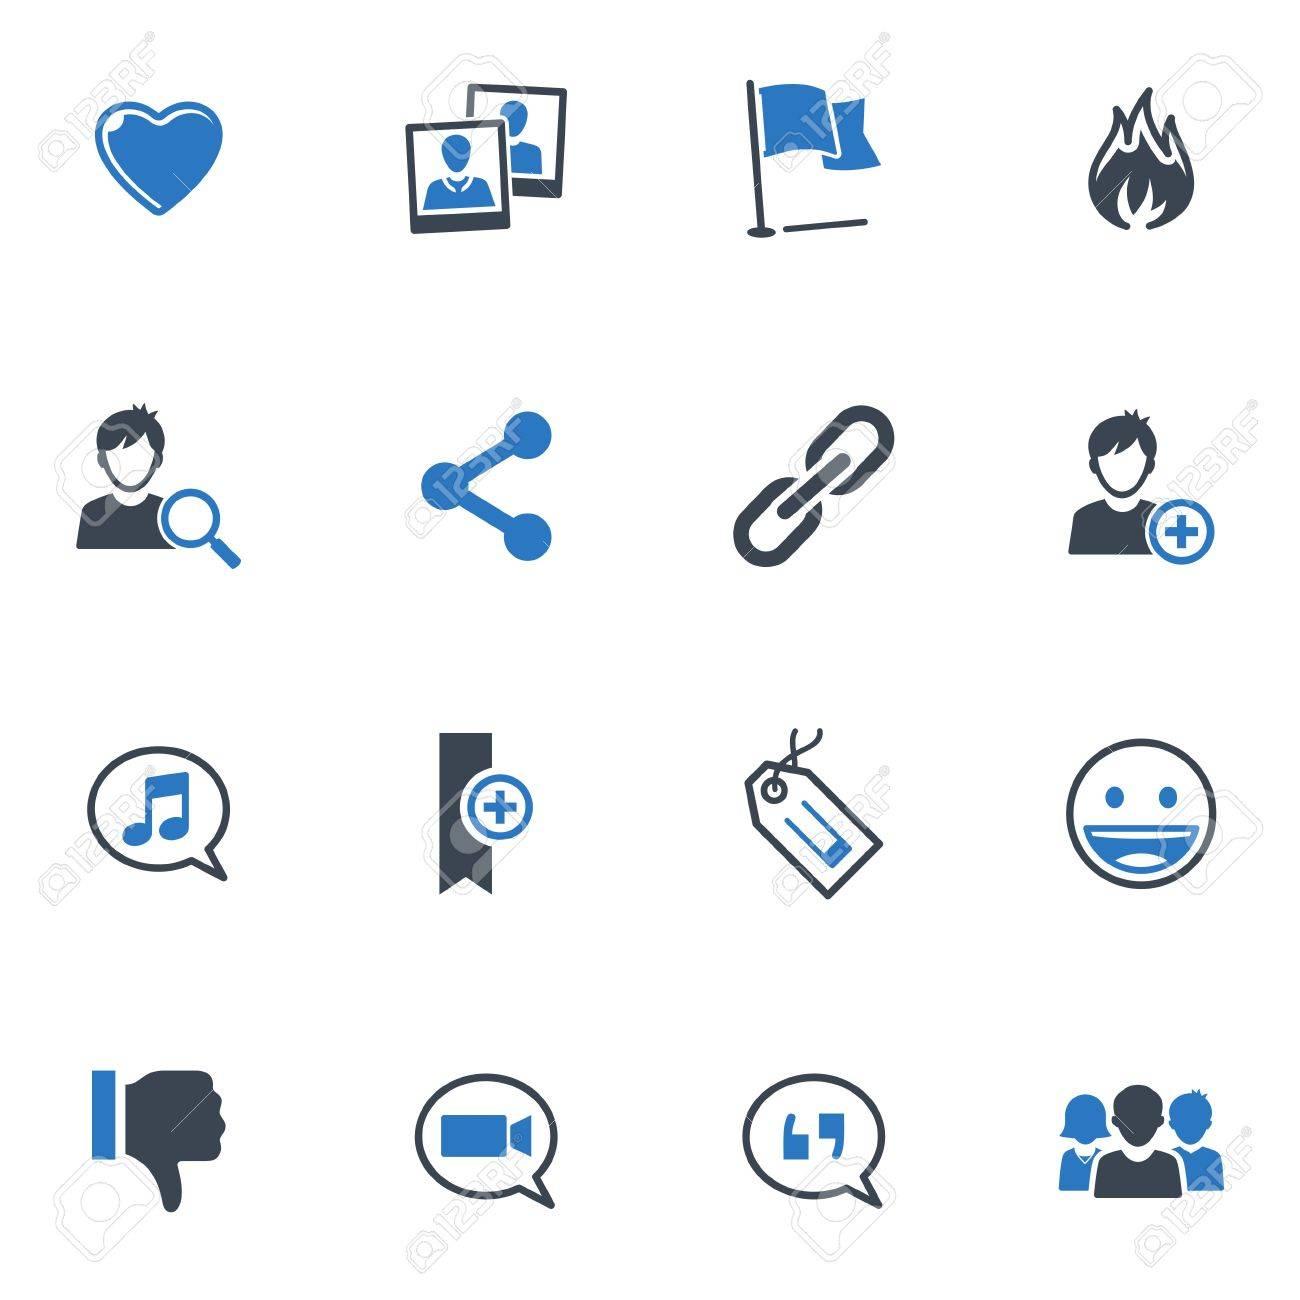 Social Media Icons Set 2 - Blue Series Stock Vector - 18025121